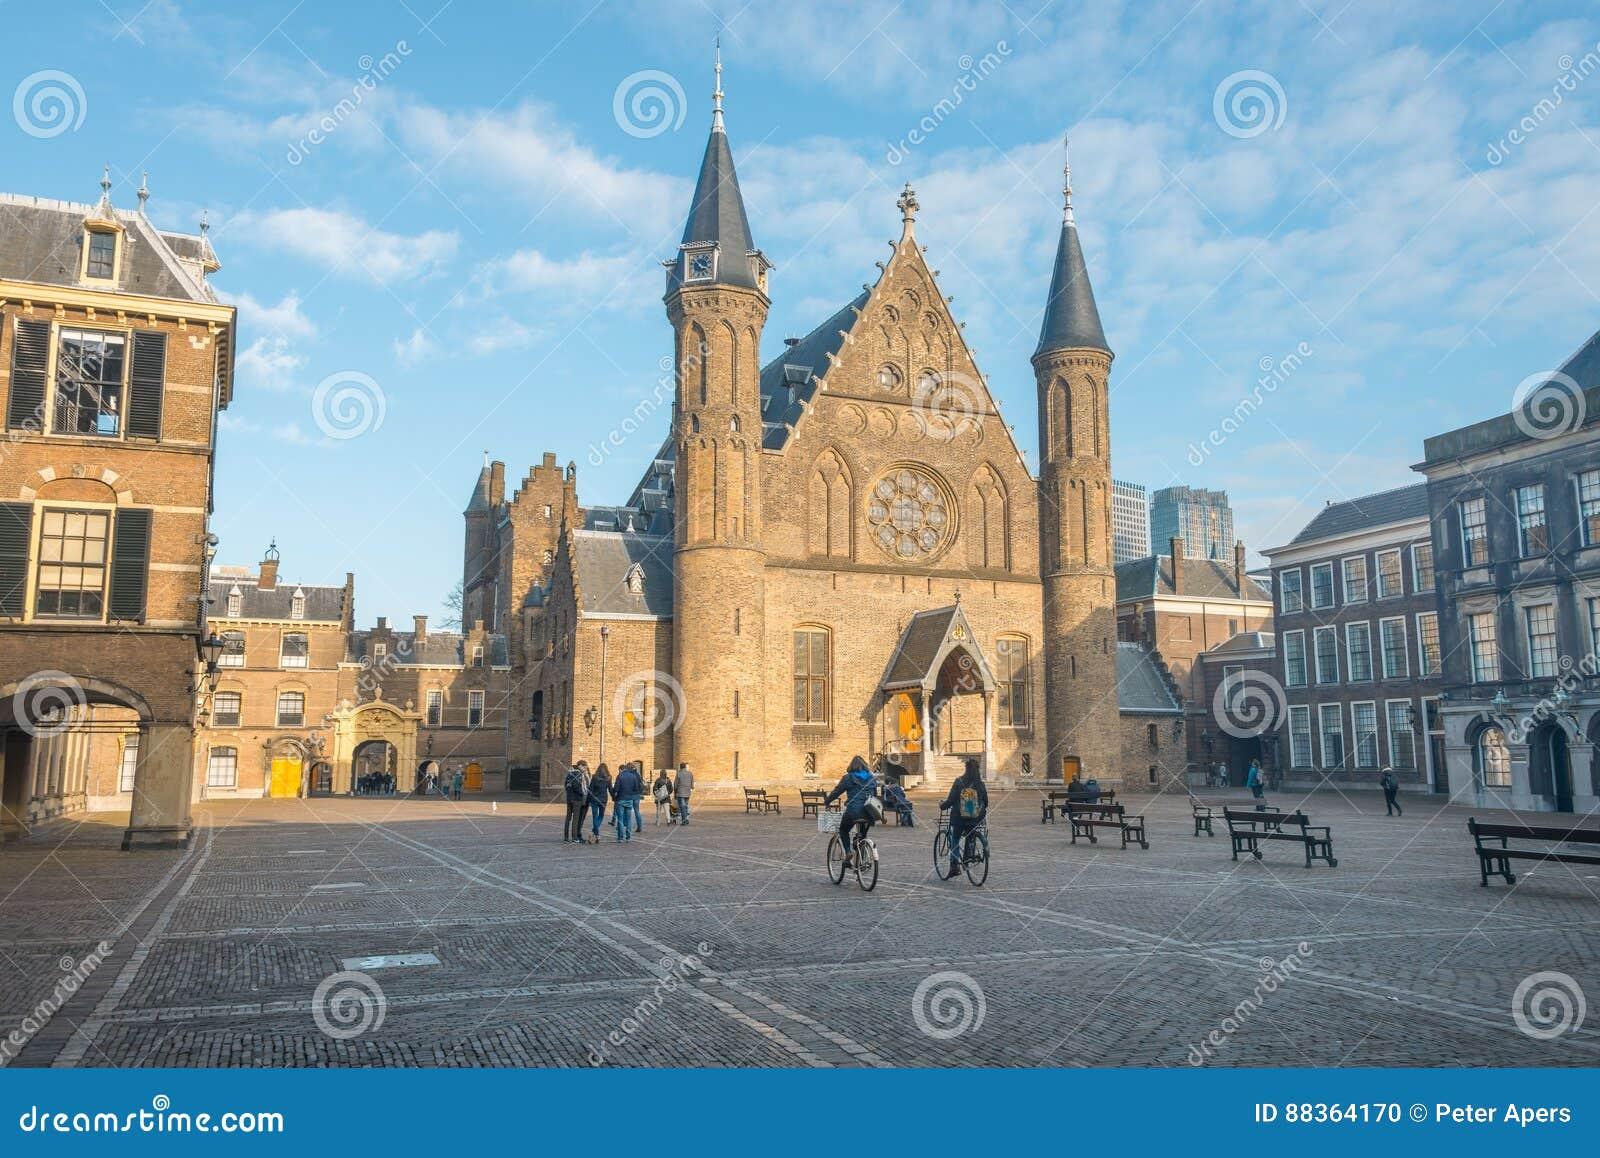 Binnenhof, political center the Netherlands